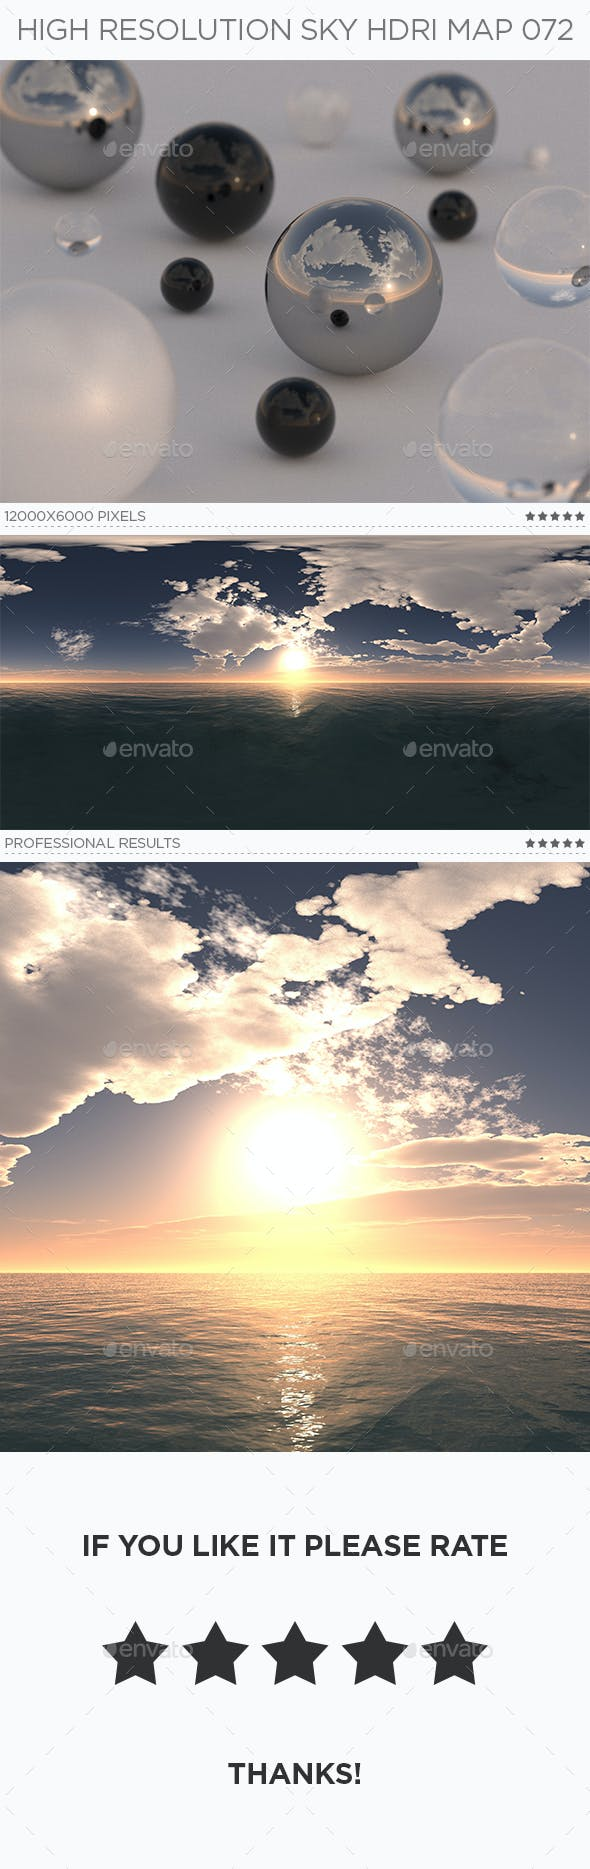 High Resolution Sky HDRi Map 072 - 3DOcean Item for Sale